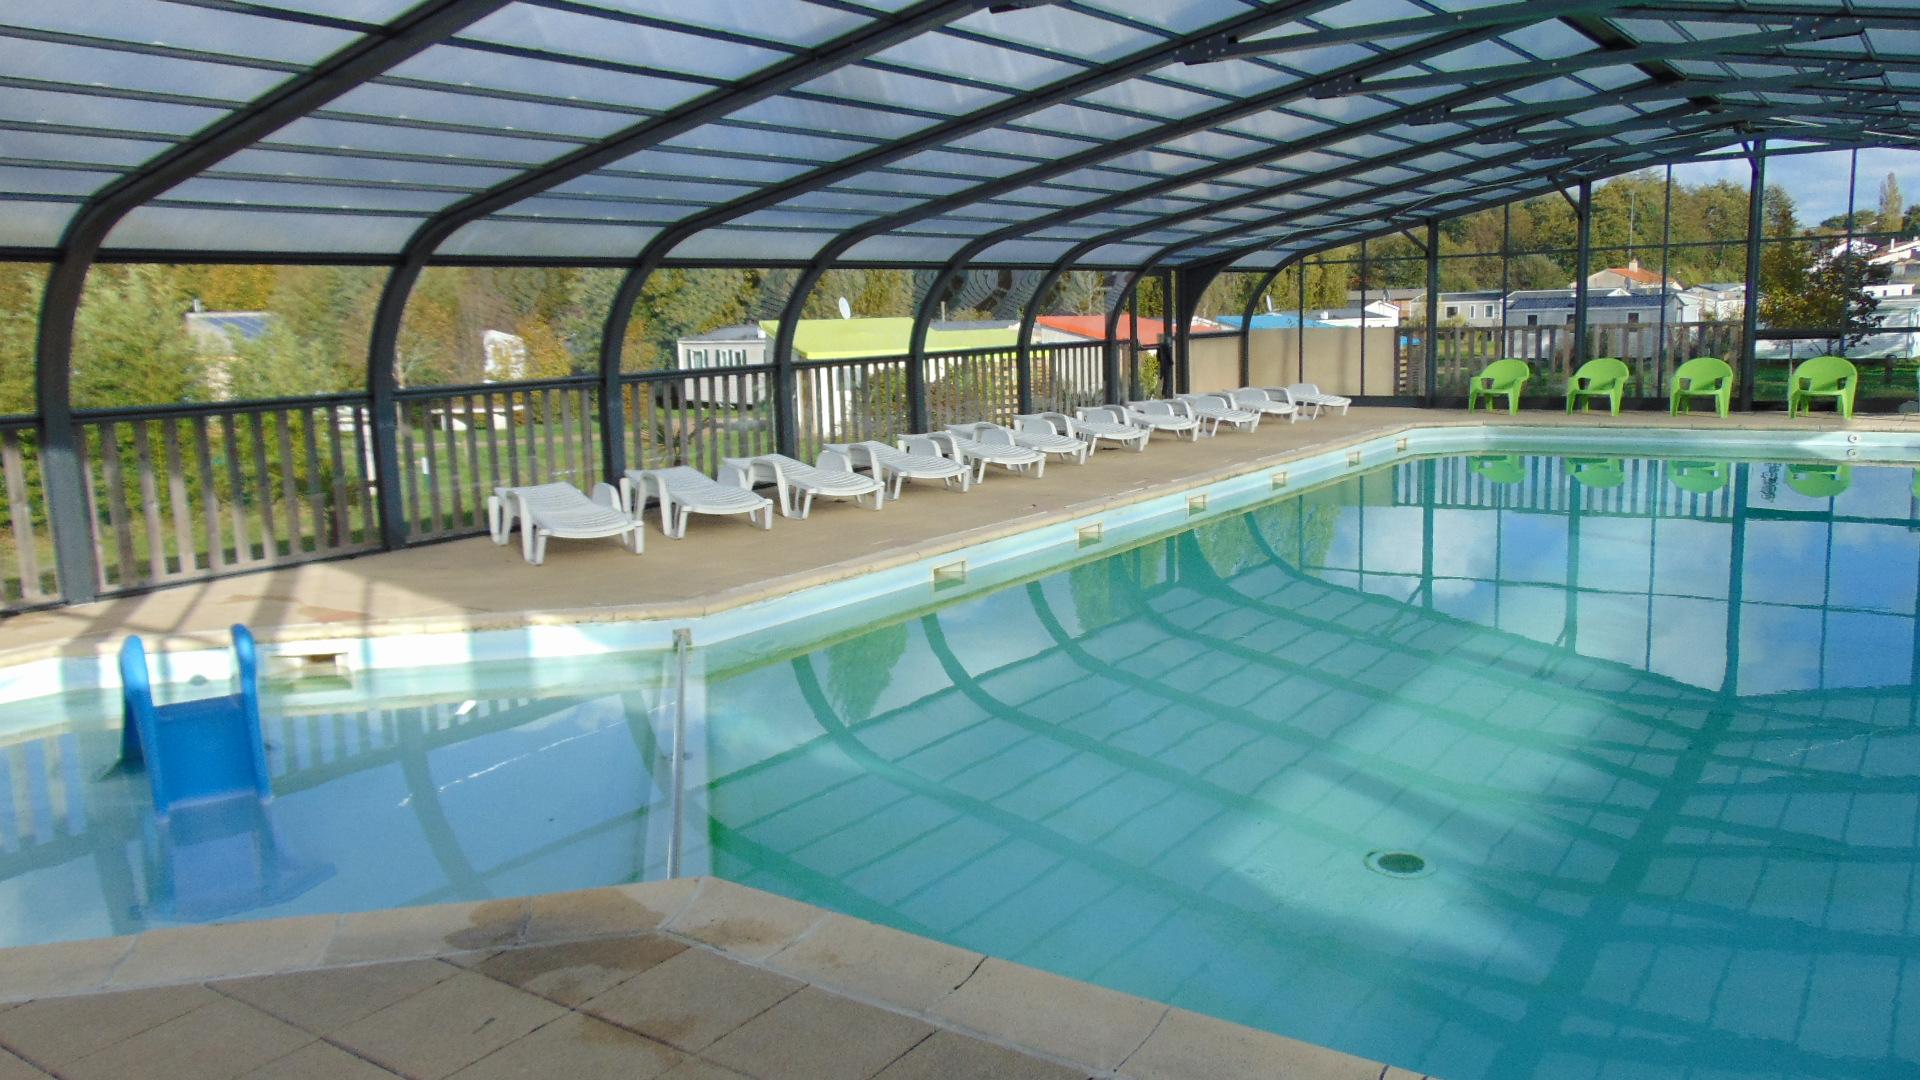 Camping vend e avec piscine couverte for Camping auvergne avec piscine couverte